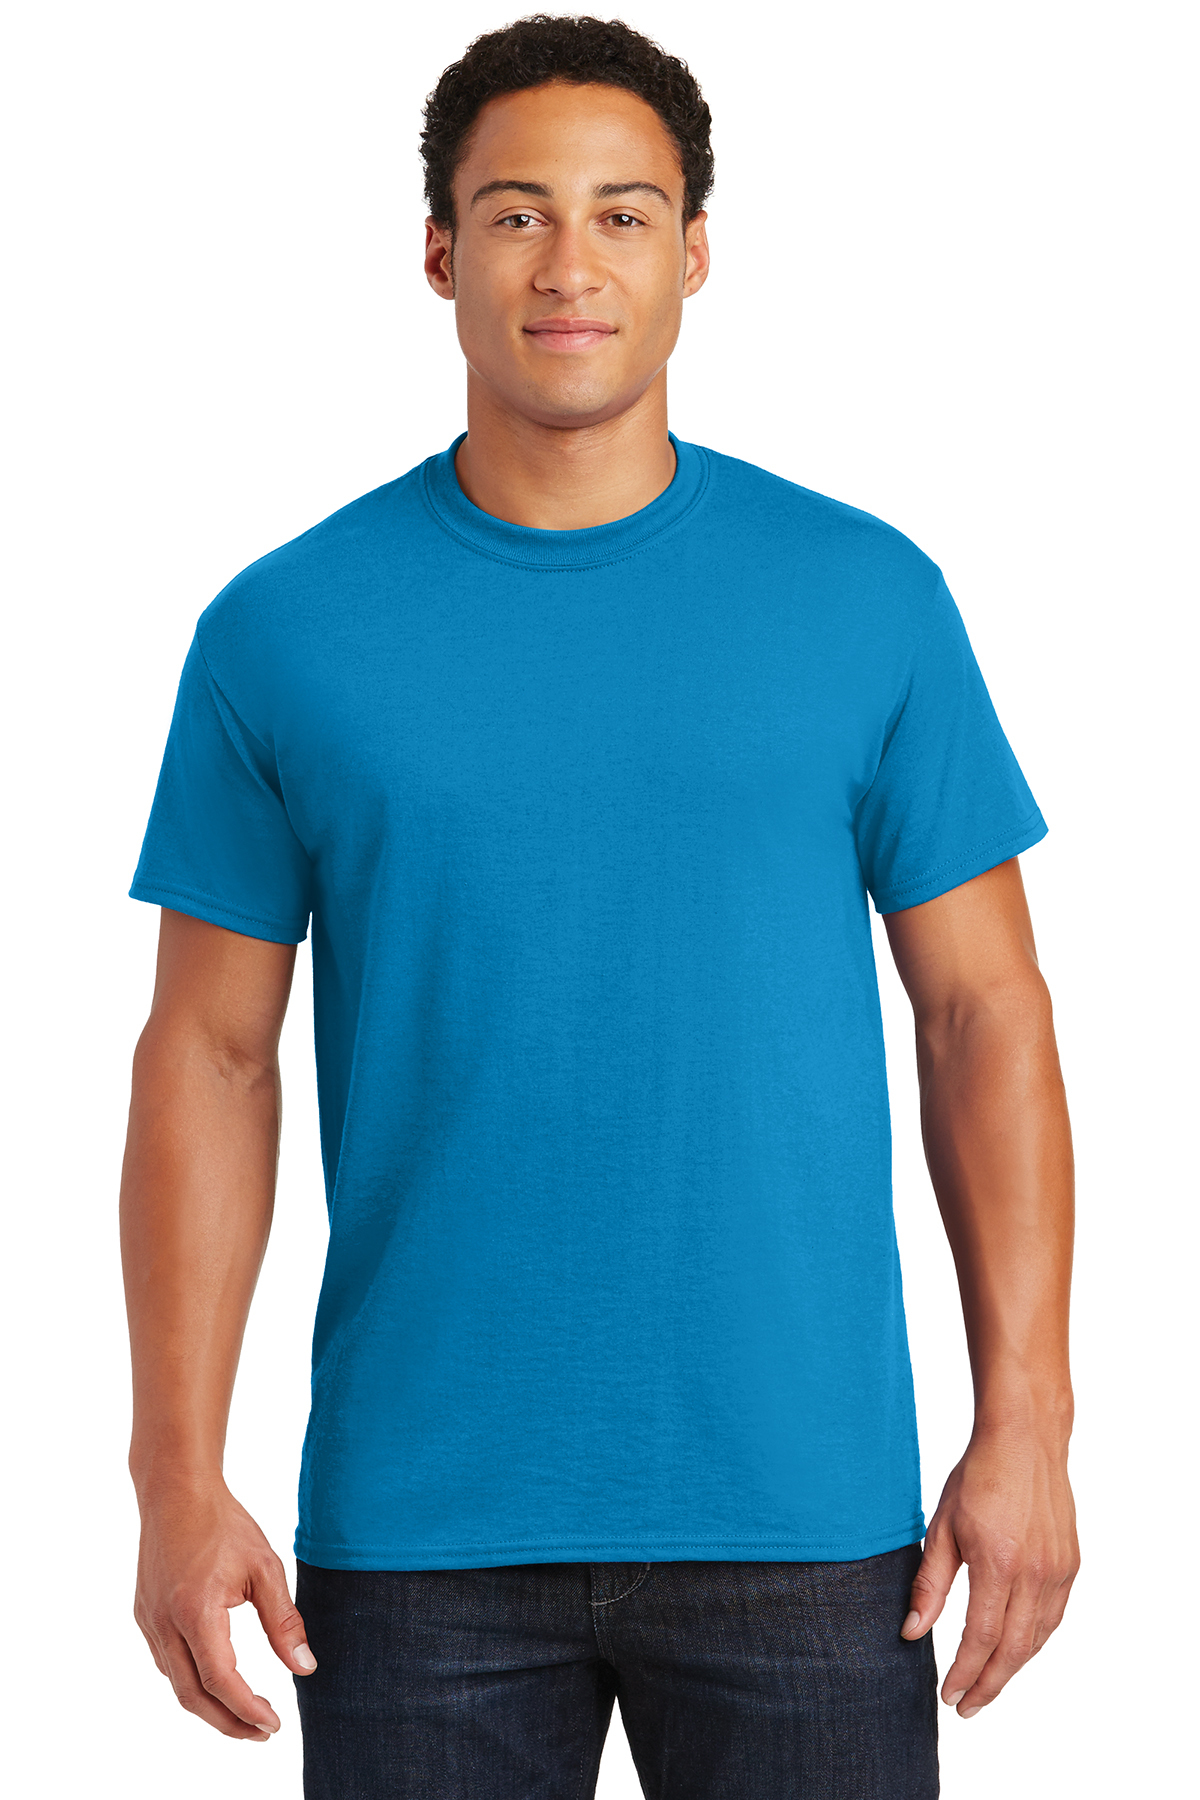 cdf5380126a220 Gildan® - DryBlend® 50 Cotton/50 Poly T-Shirt | 50/50 Blend | T-Shirts ...